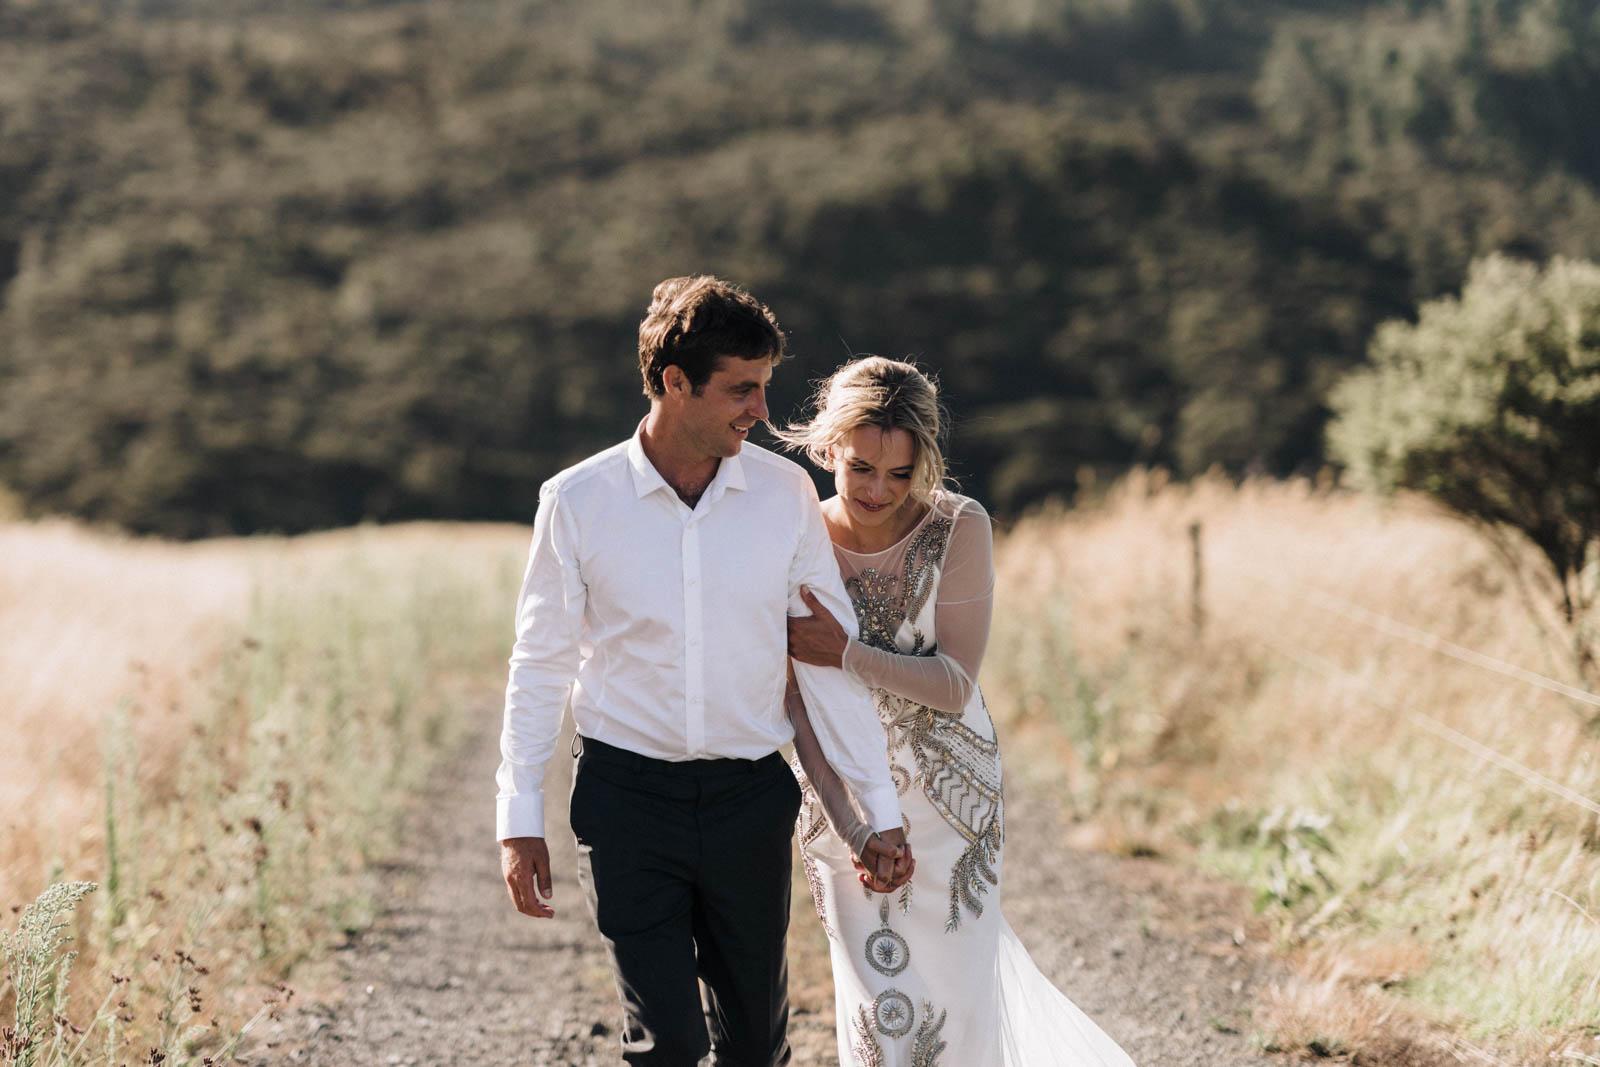 newfound-l-i-coromandel-wedding-photographer-1807-A9_04262